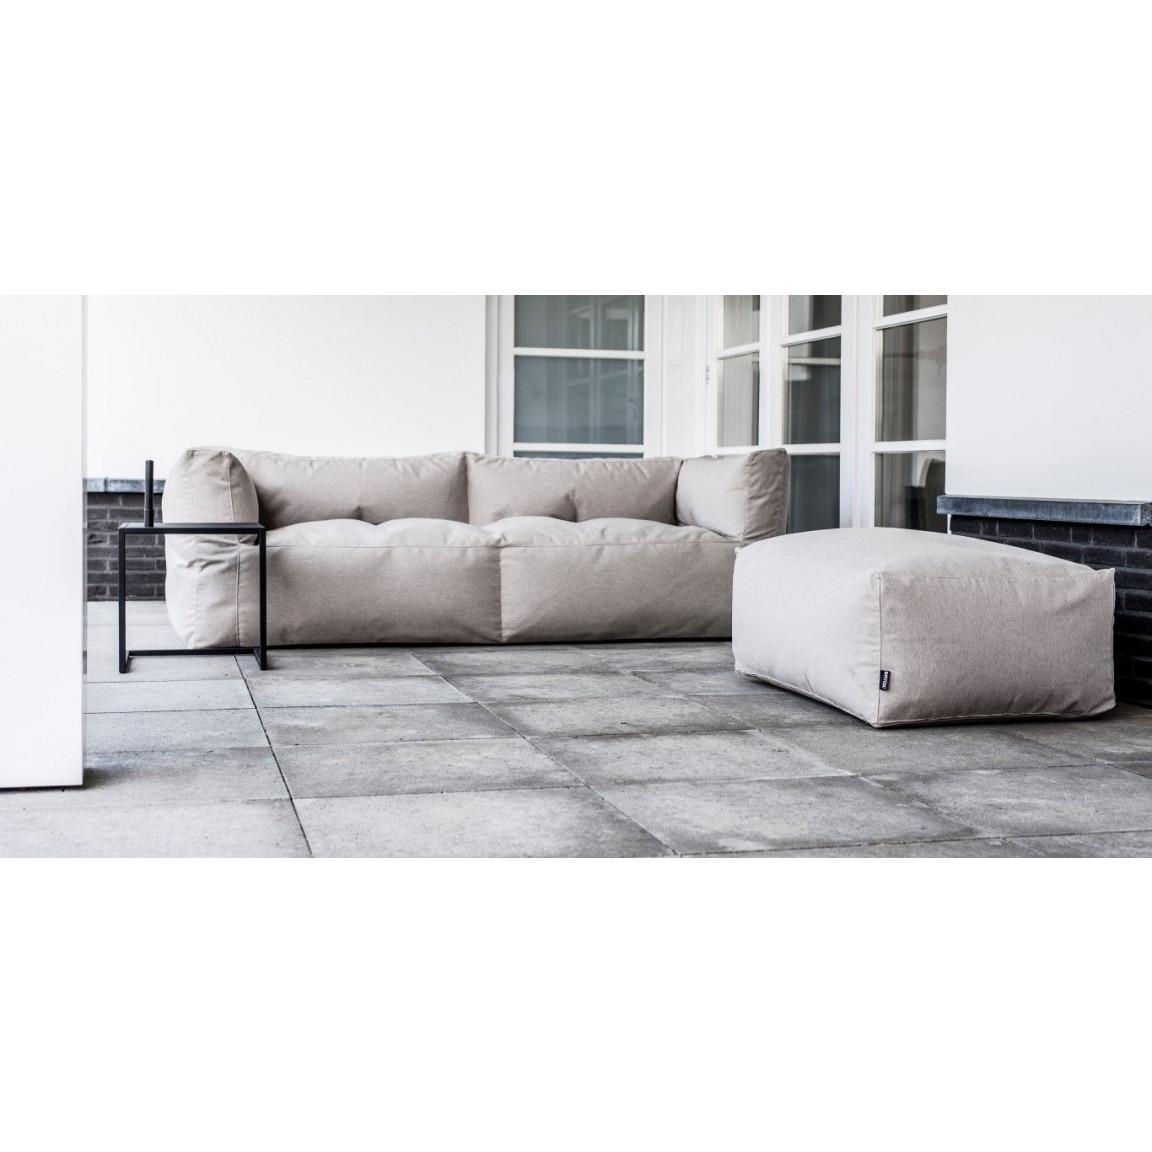 Couch 3-Seat   PINKoddy Dark